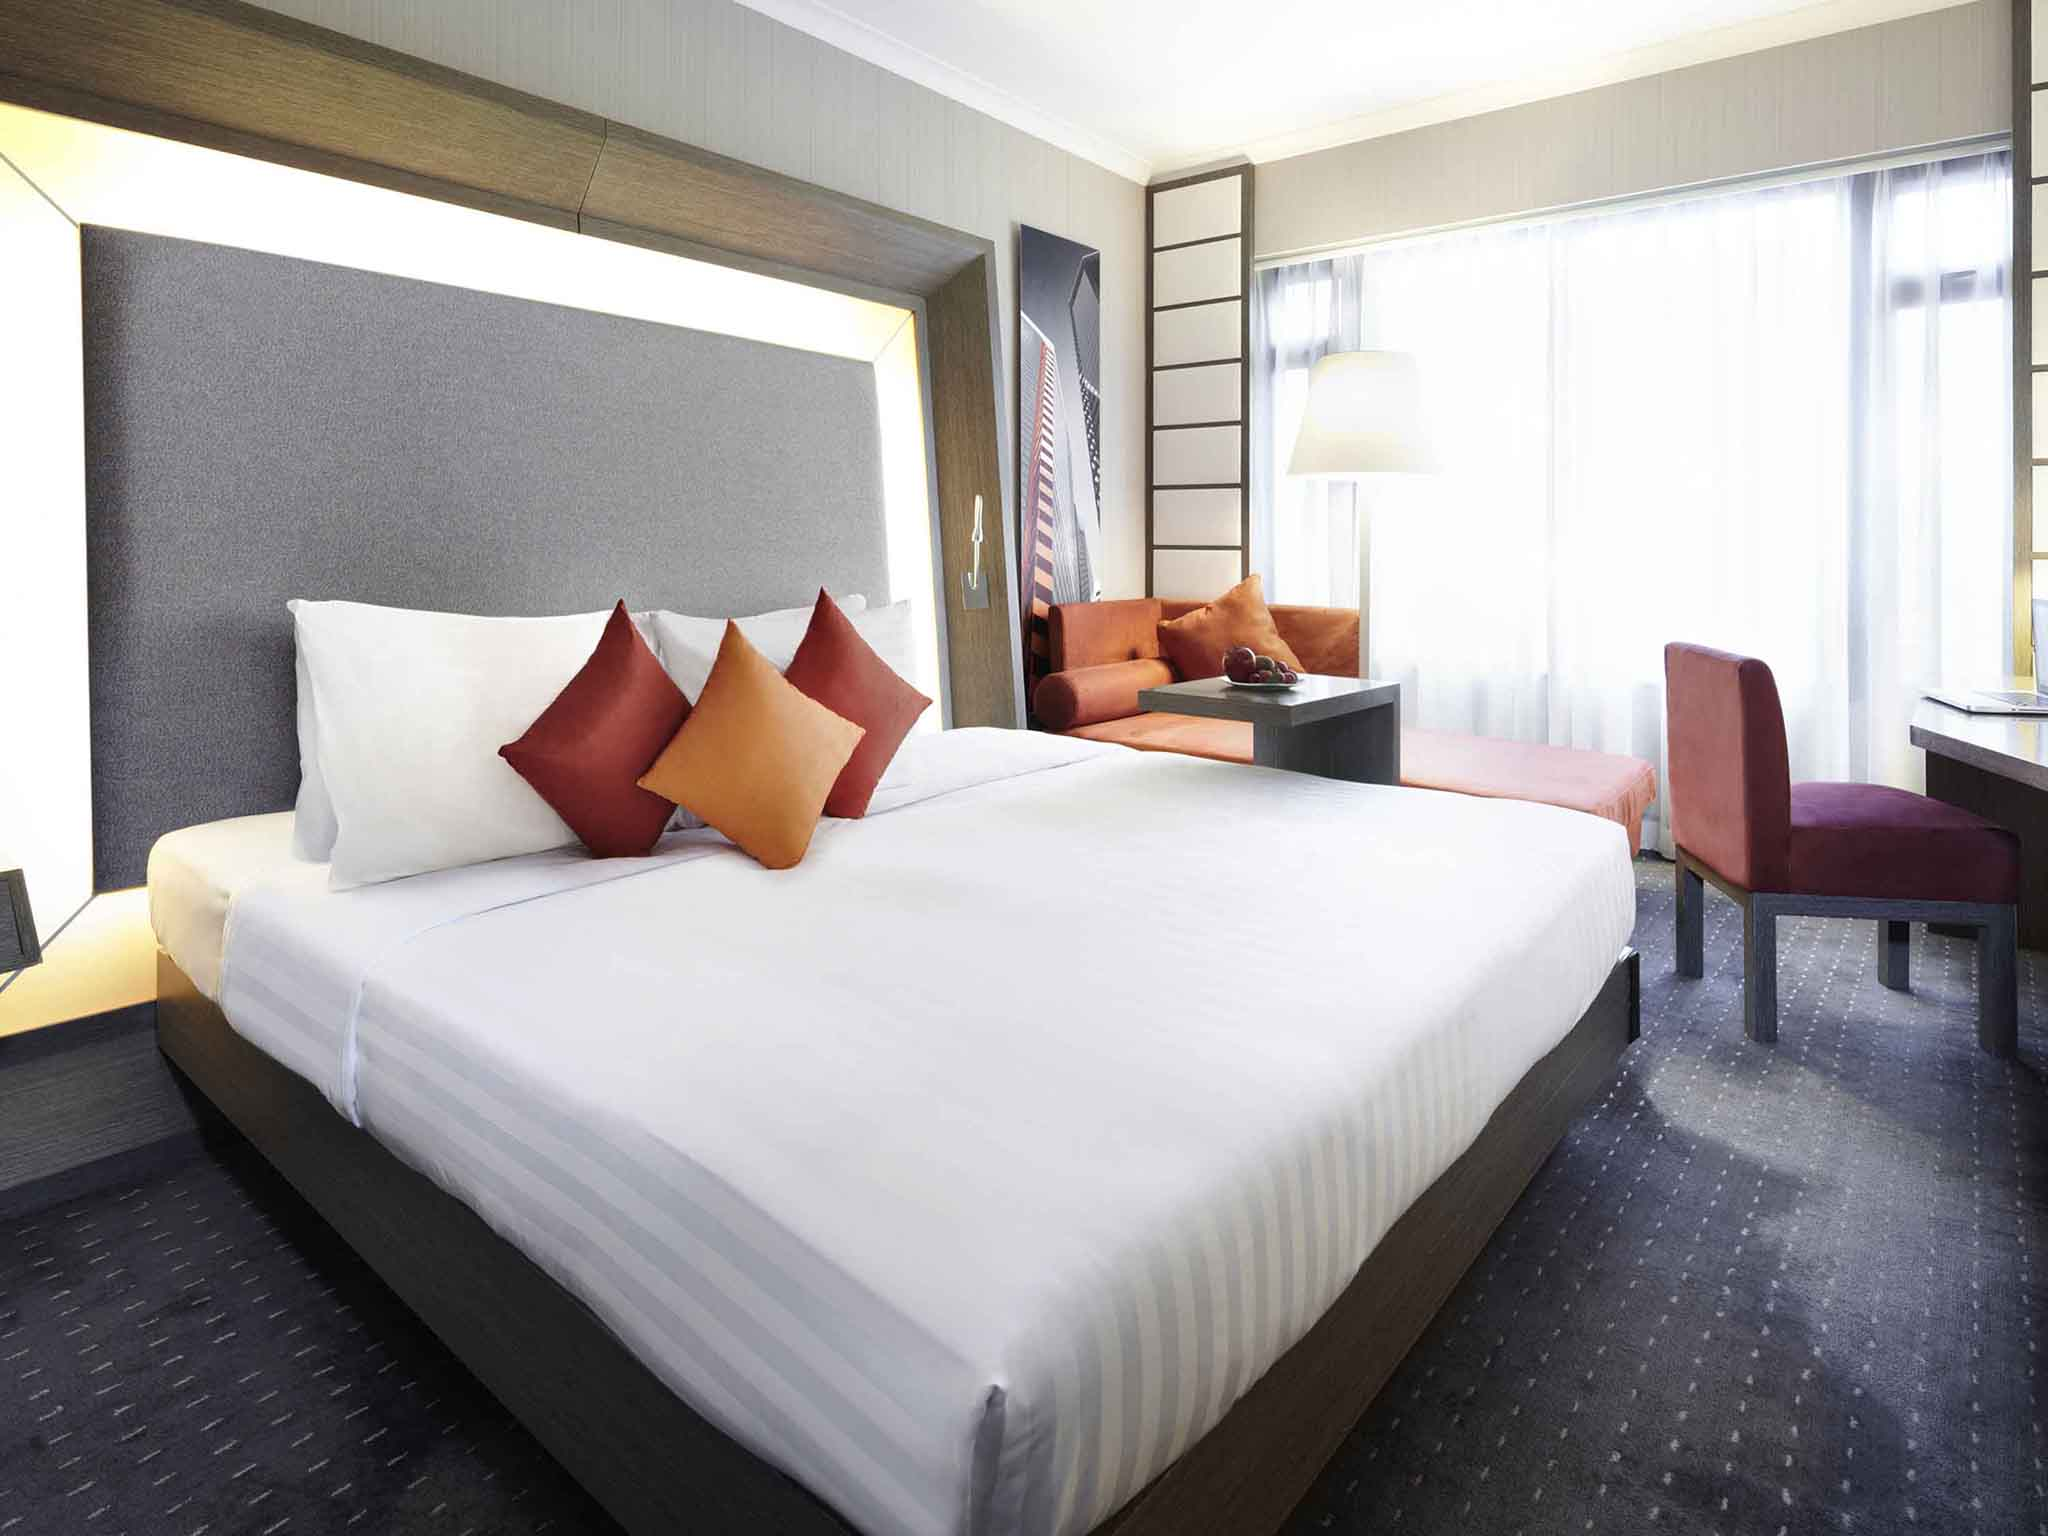 فندق - نوفوتيل Novotel هونغ كونغ ناثان رود كاولون